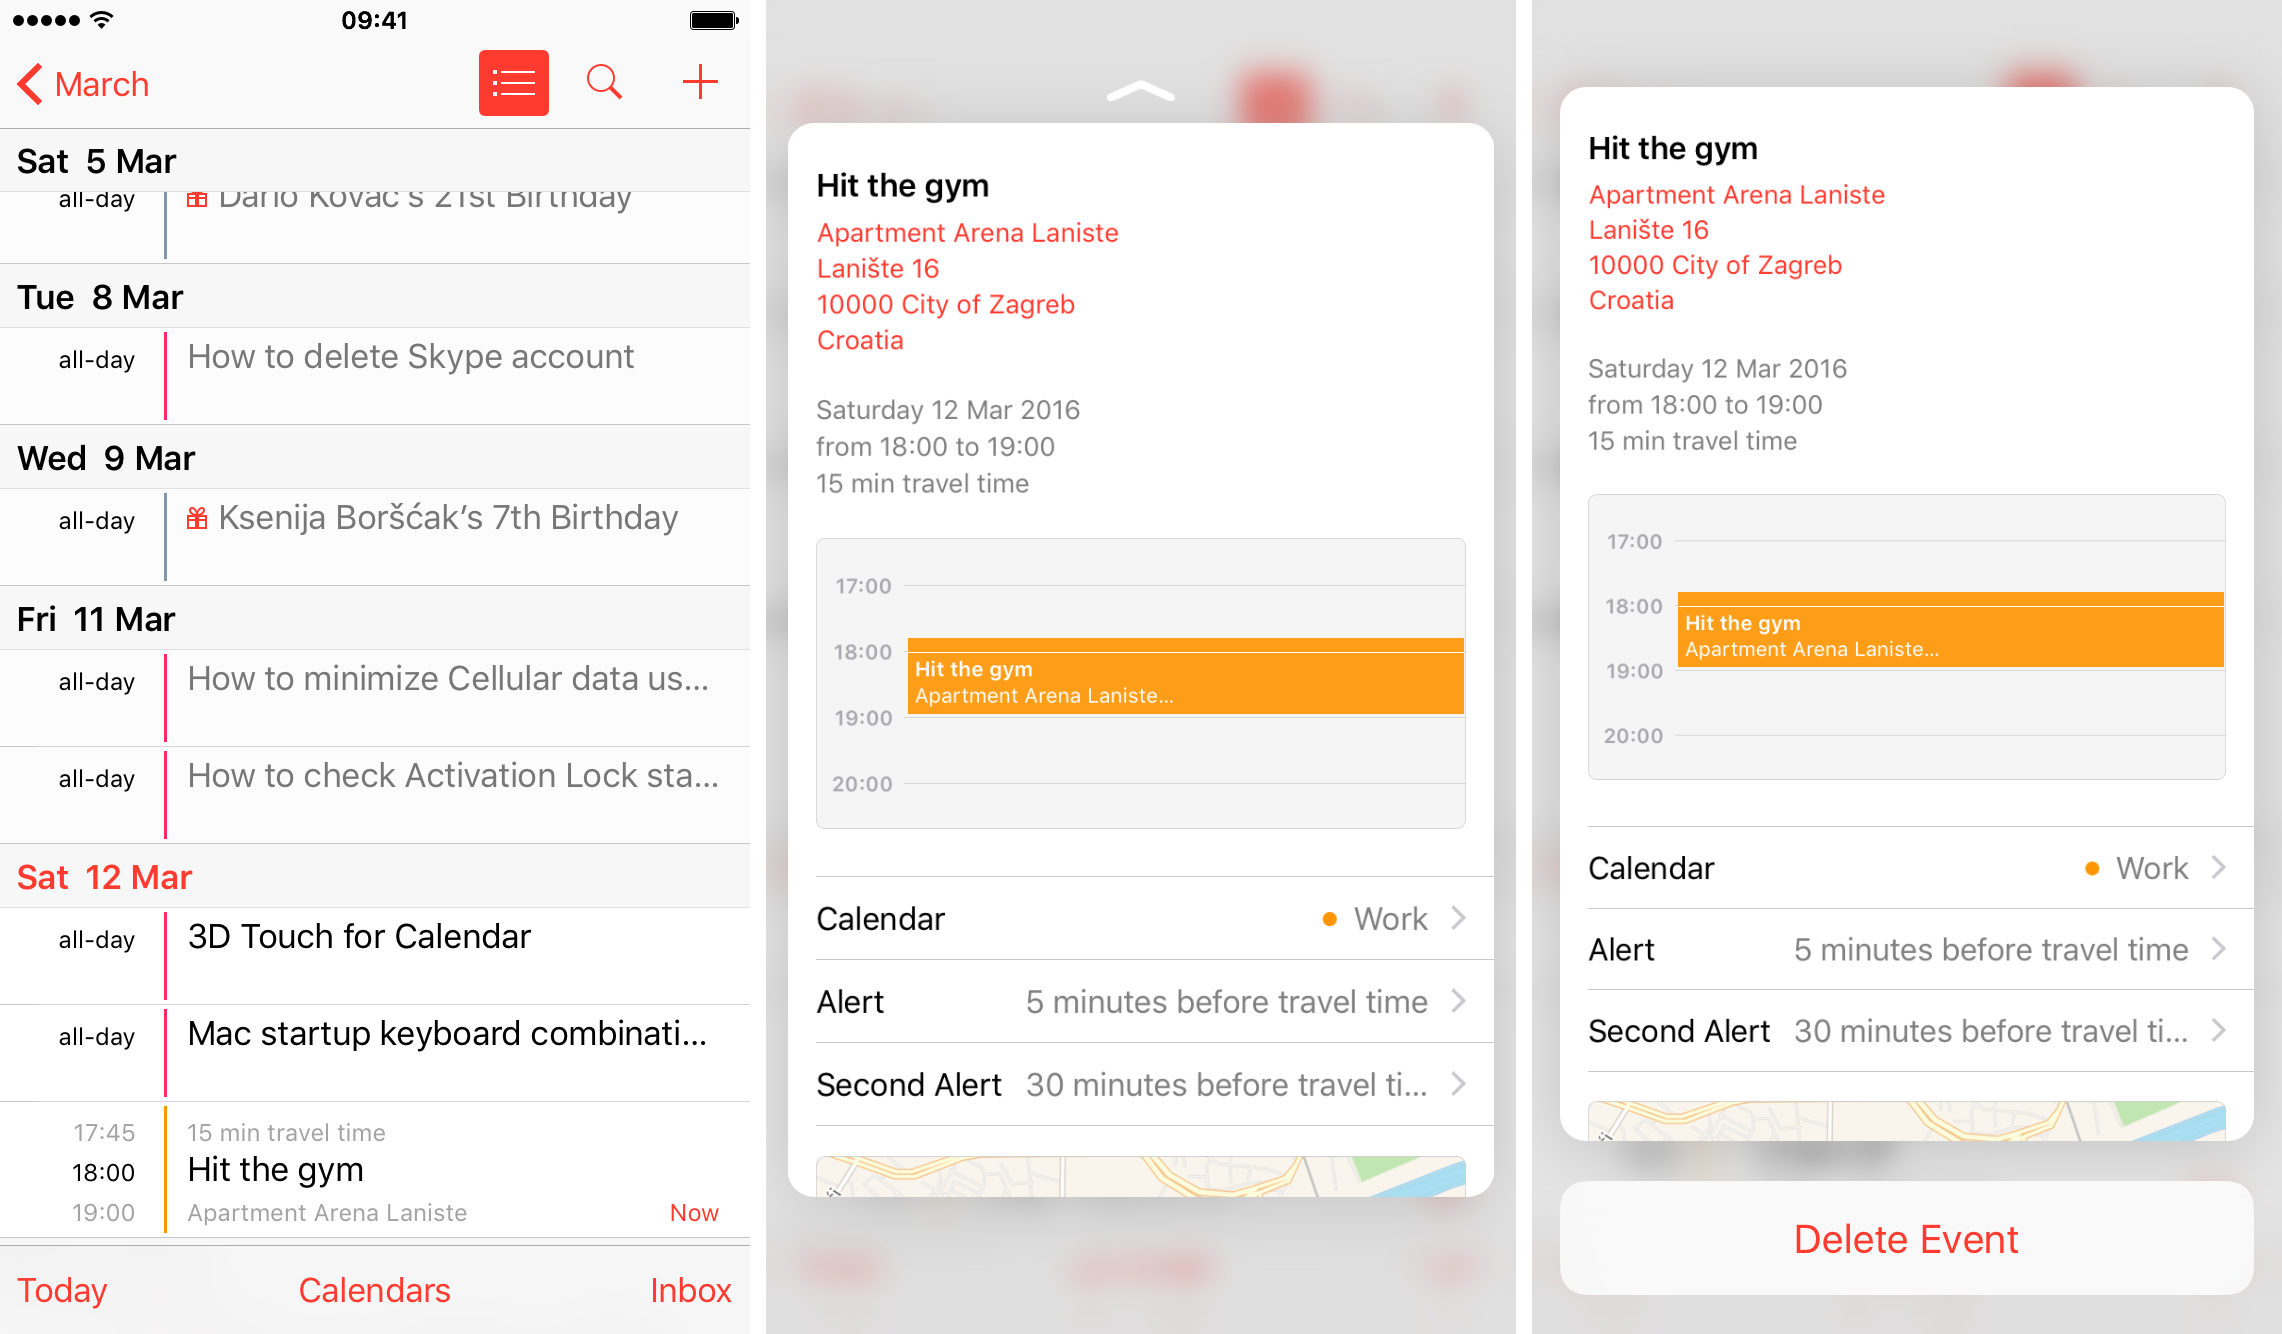 iOS 9 Calendar 3D Touch preview events iPhone 6s screenshot 005